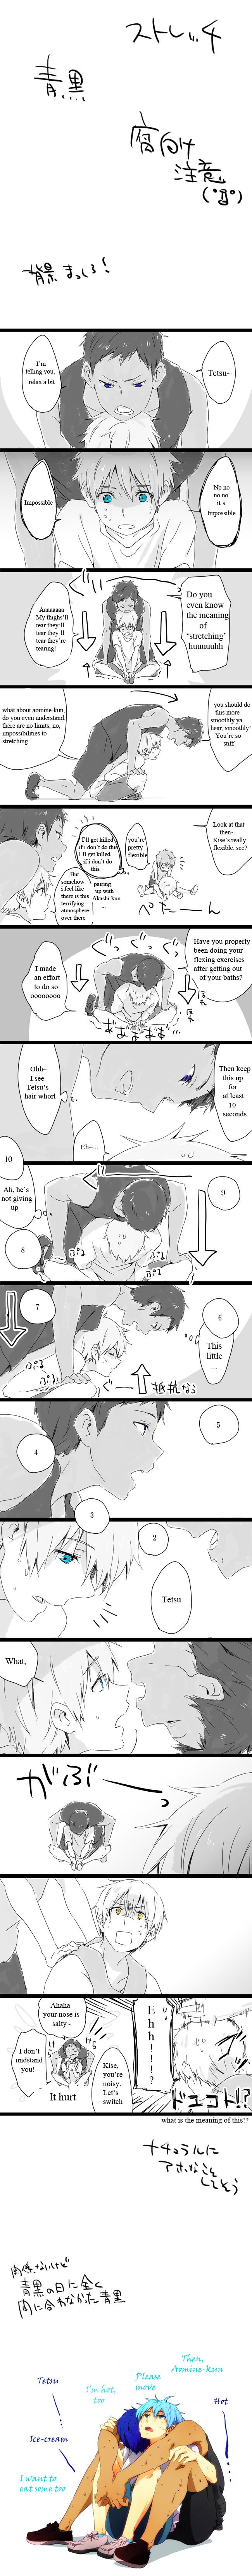 Tags: Anime, Tsukimushi, Kuroko no Basuke, Akashi Seijuurou, Aomine Daiki, Kuroko Tetsuya, Kise Ryouta, Pixiv, Comic, Translated, Manga Page, Kiseki no Sedai, Kuroko's Basketball